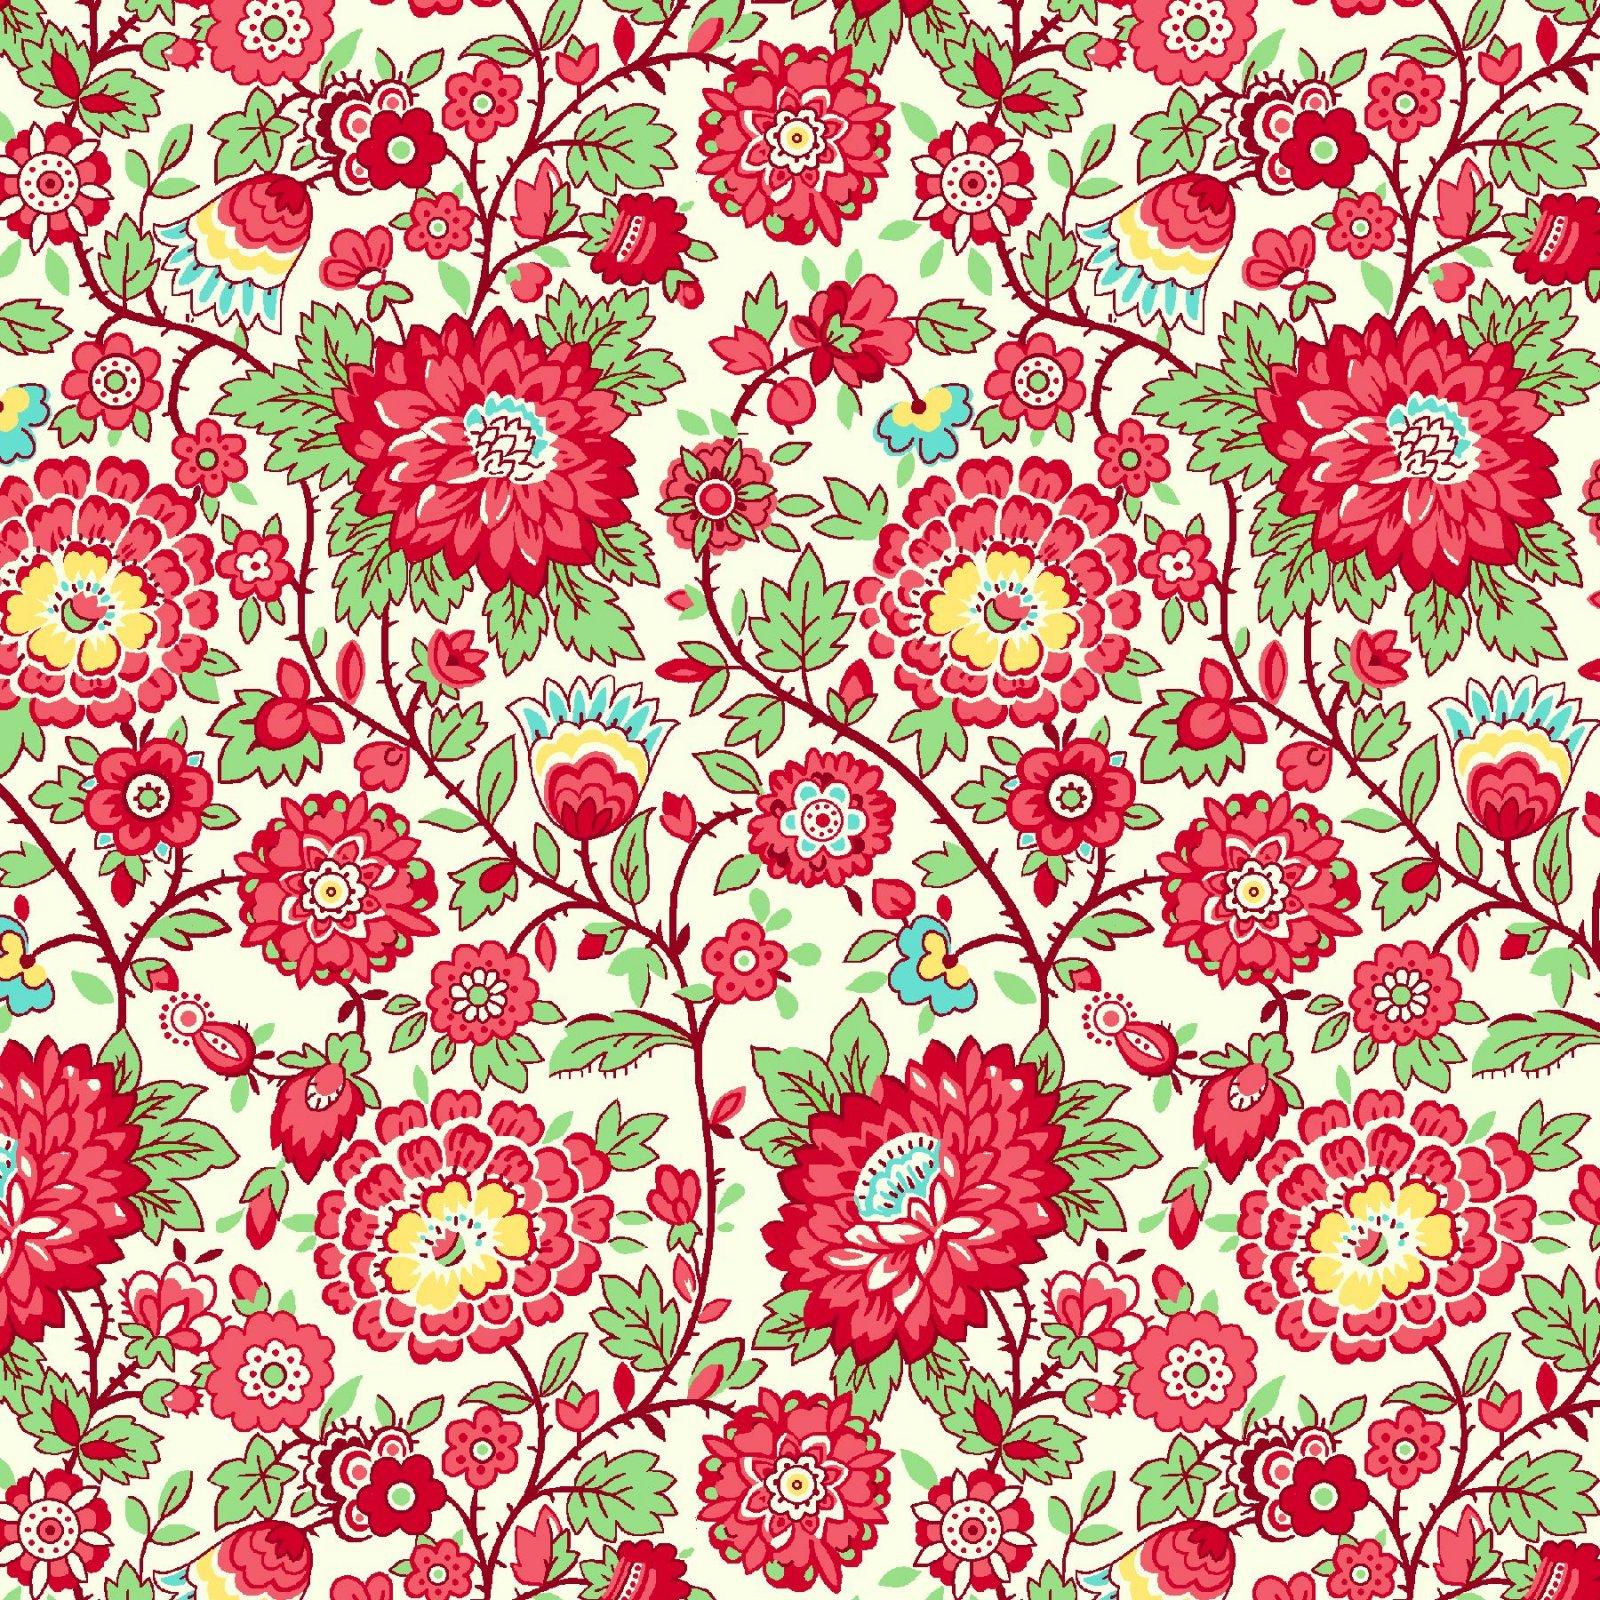 HG-Nana Mae V 9686-8 Red - Medium Floral